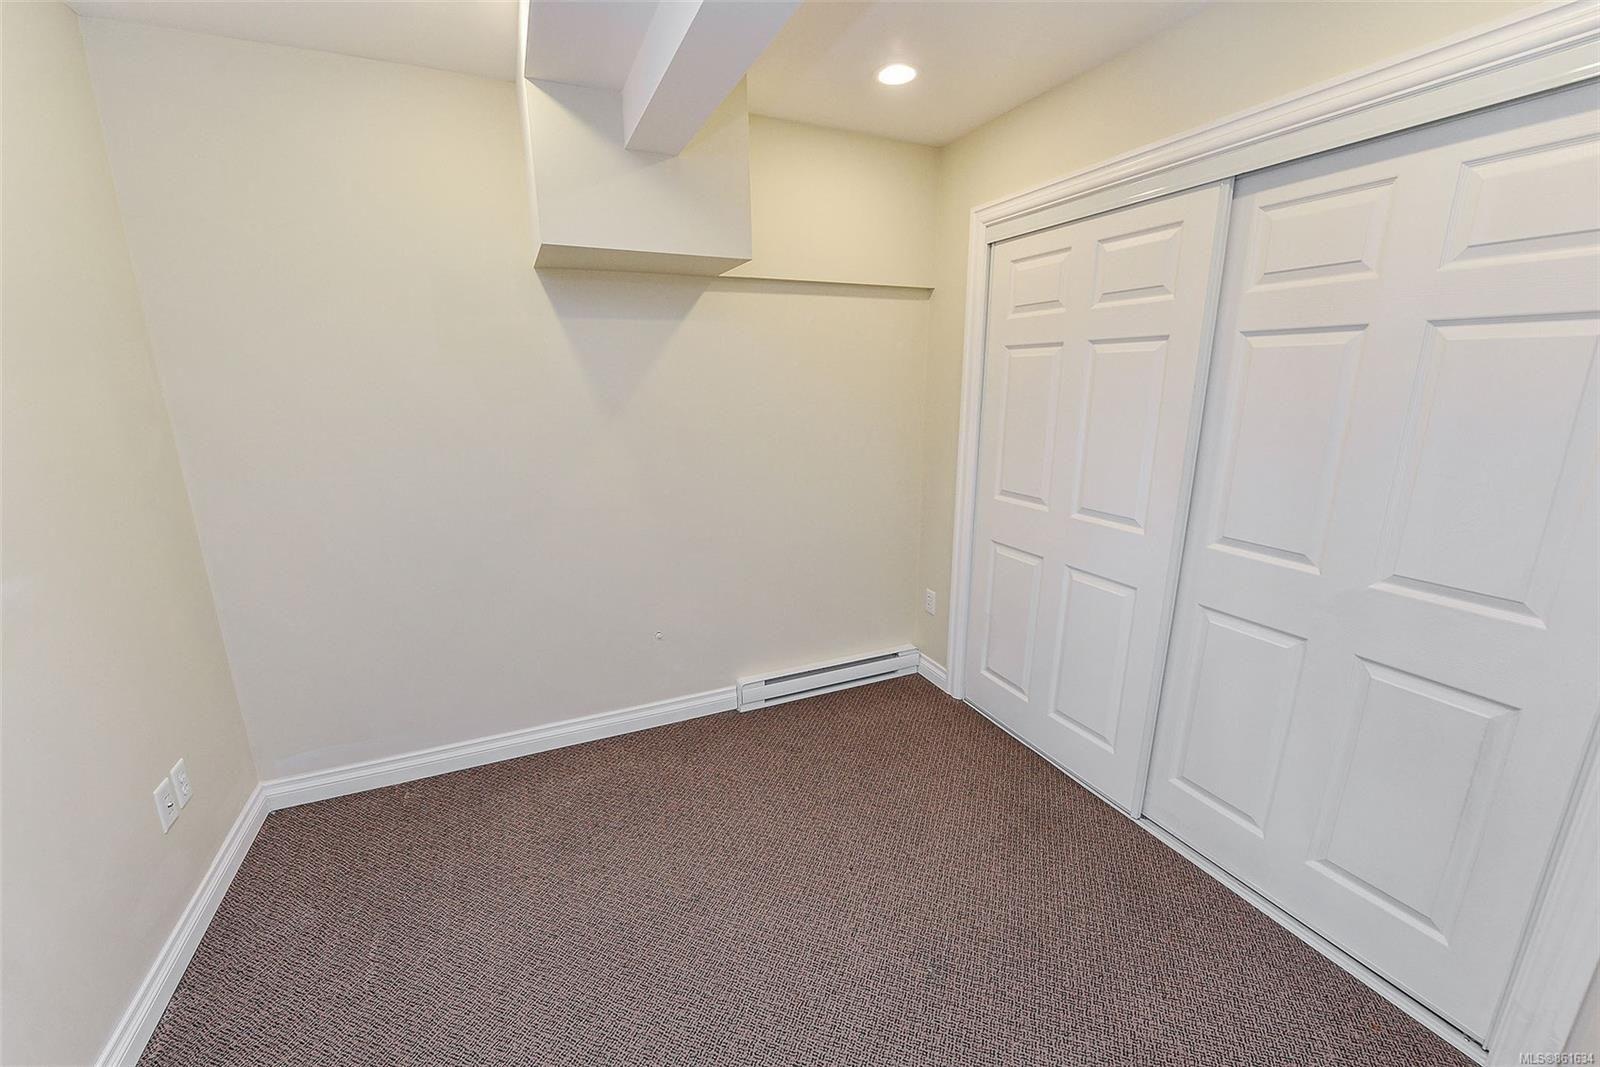 Photo 6: Photos: 367 E Burnside Rd in : Vi Burnside Quadruplex for sale (Victoria)  : MLS®# 861634